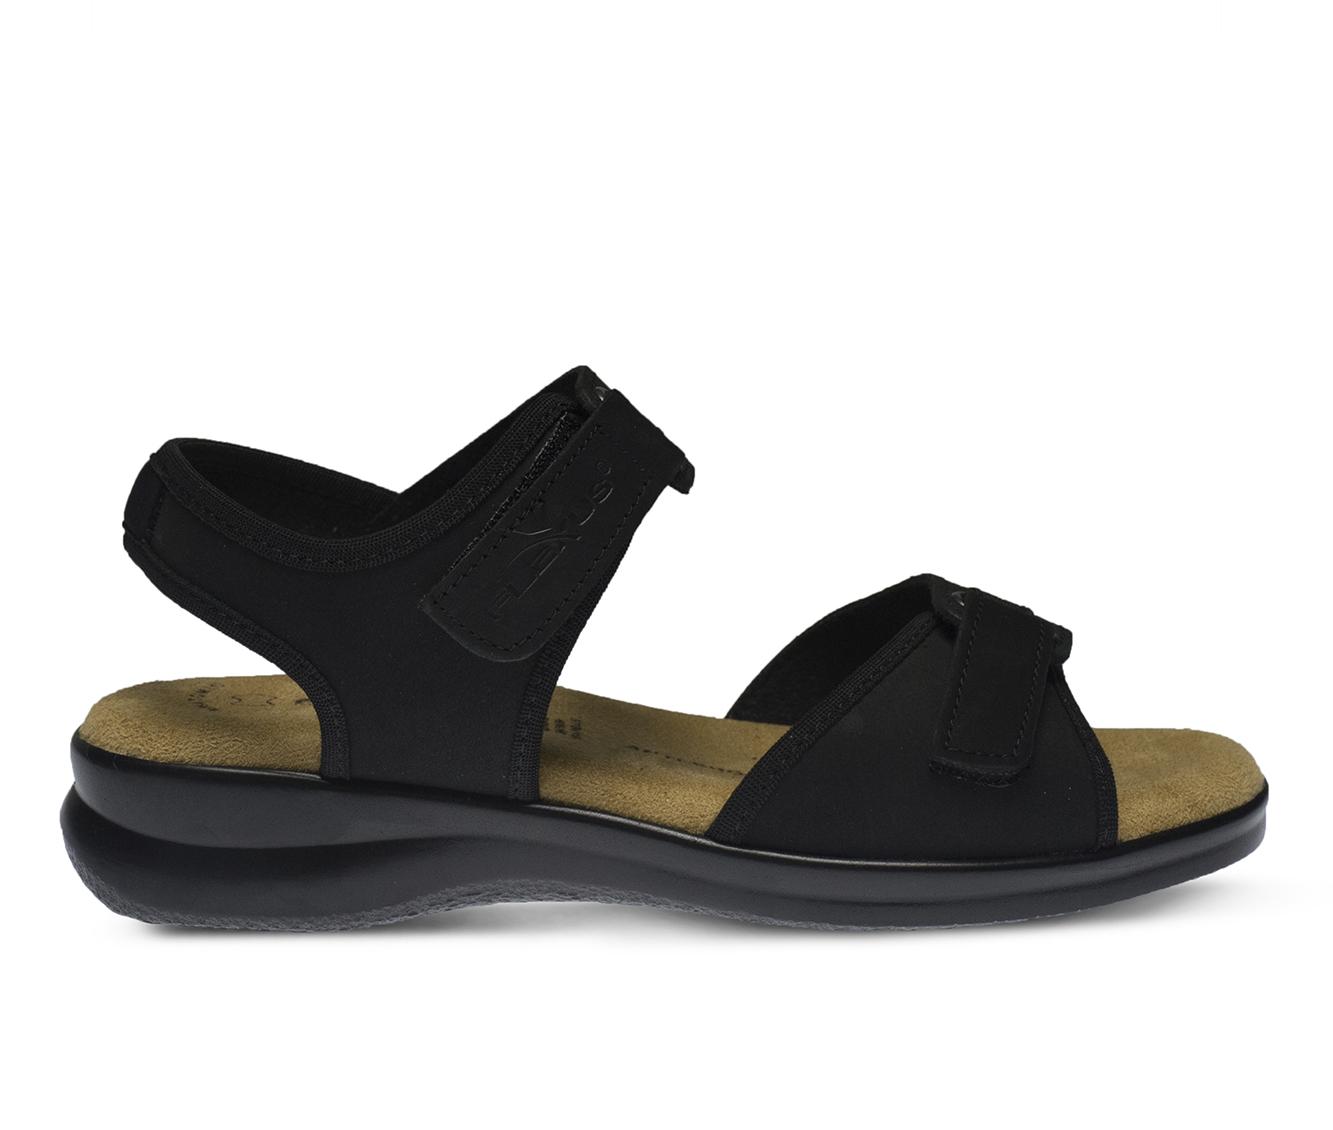 Flexus Danila Women's Sandal (Black Leather)